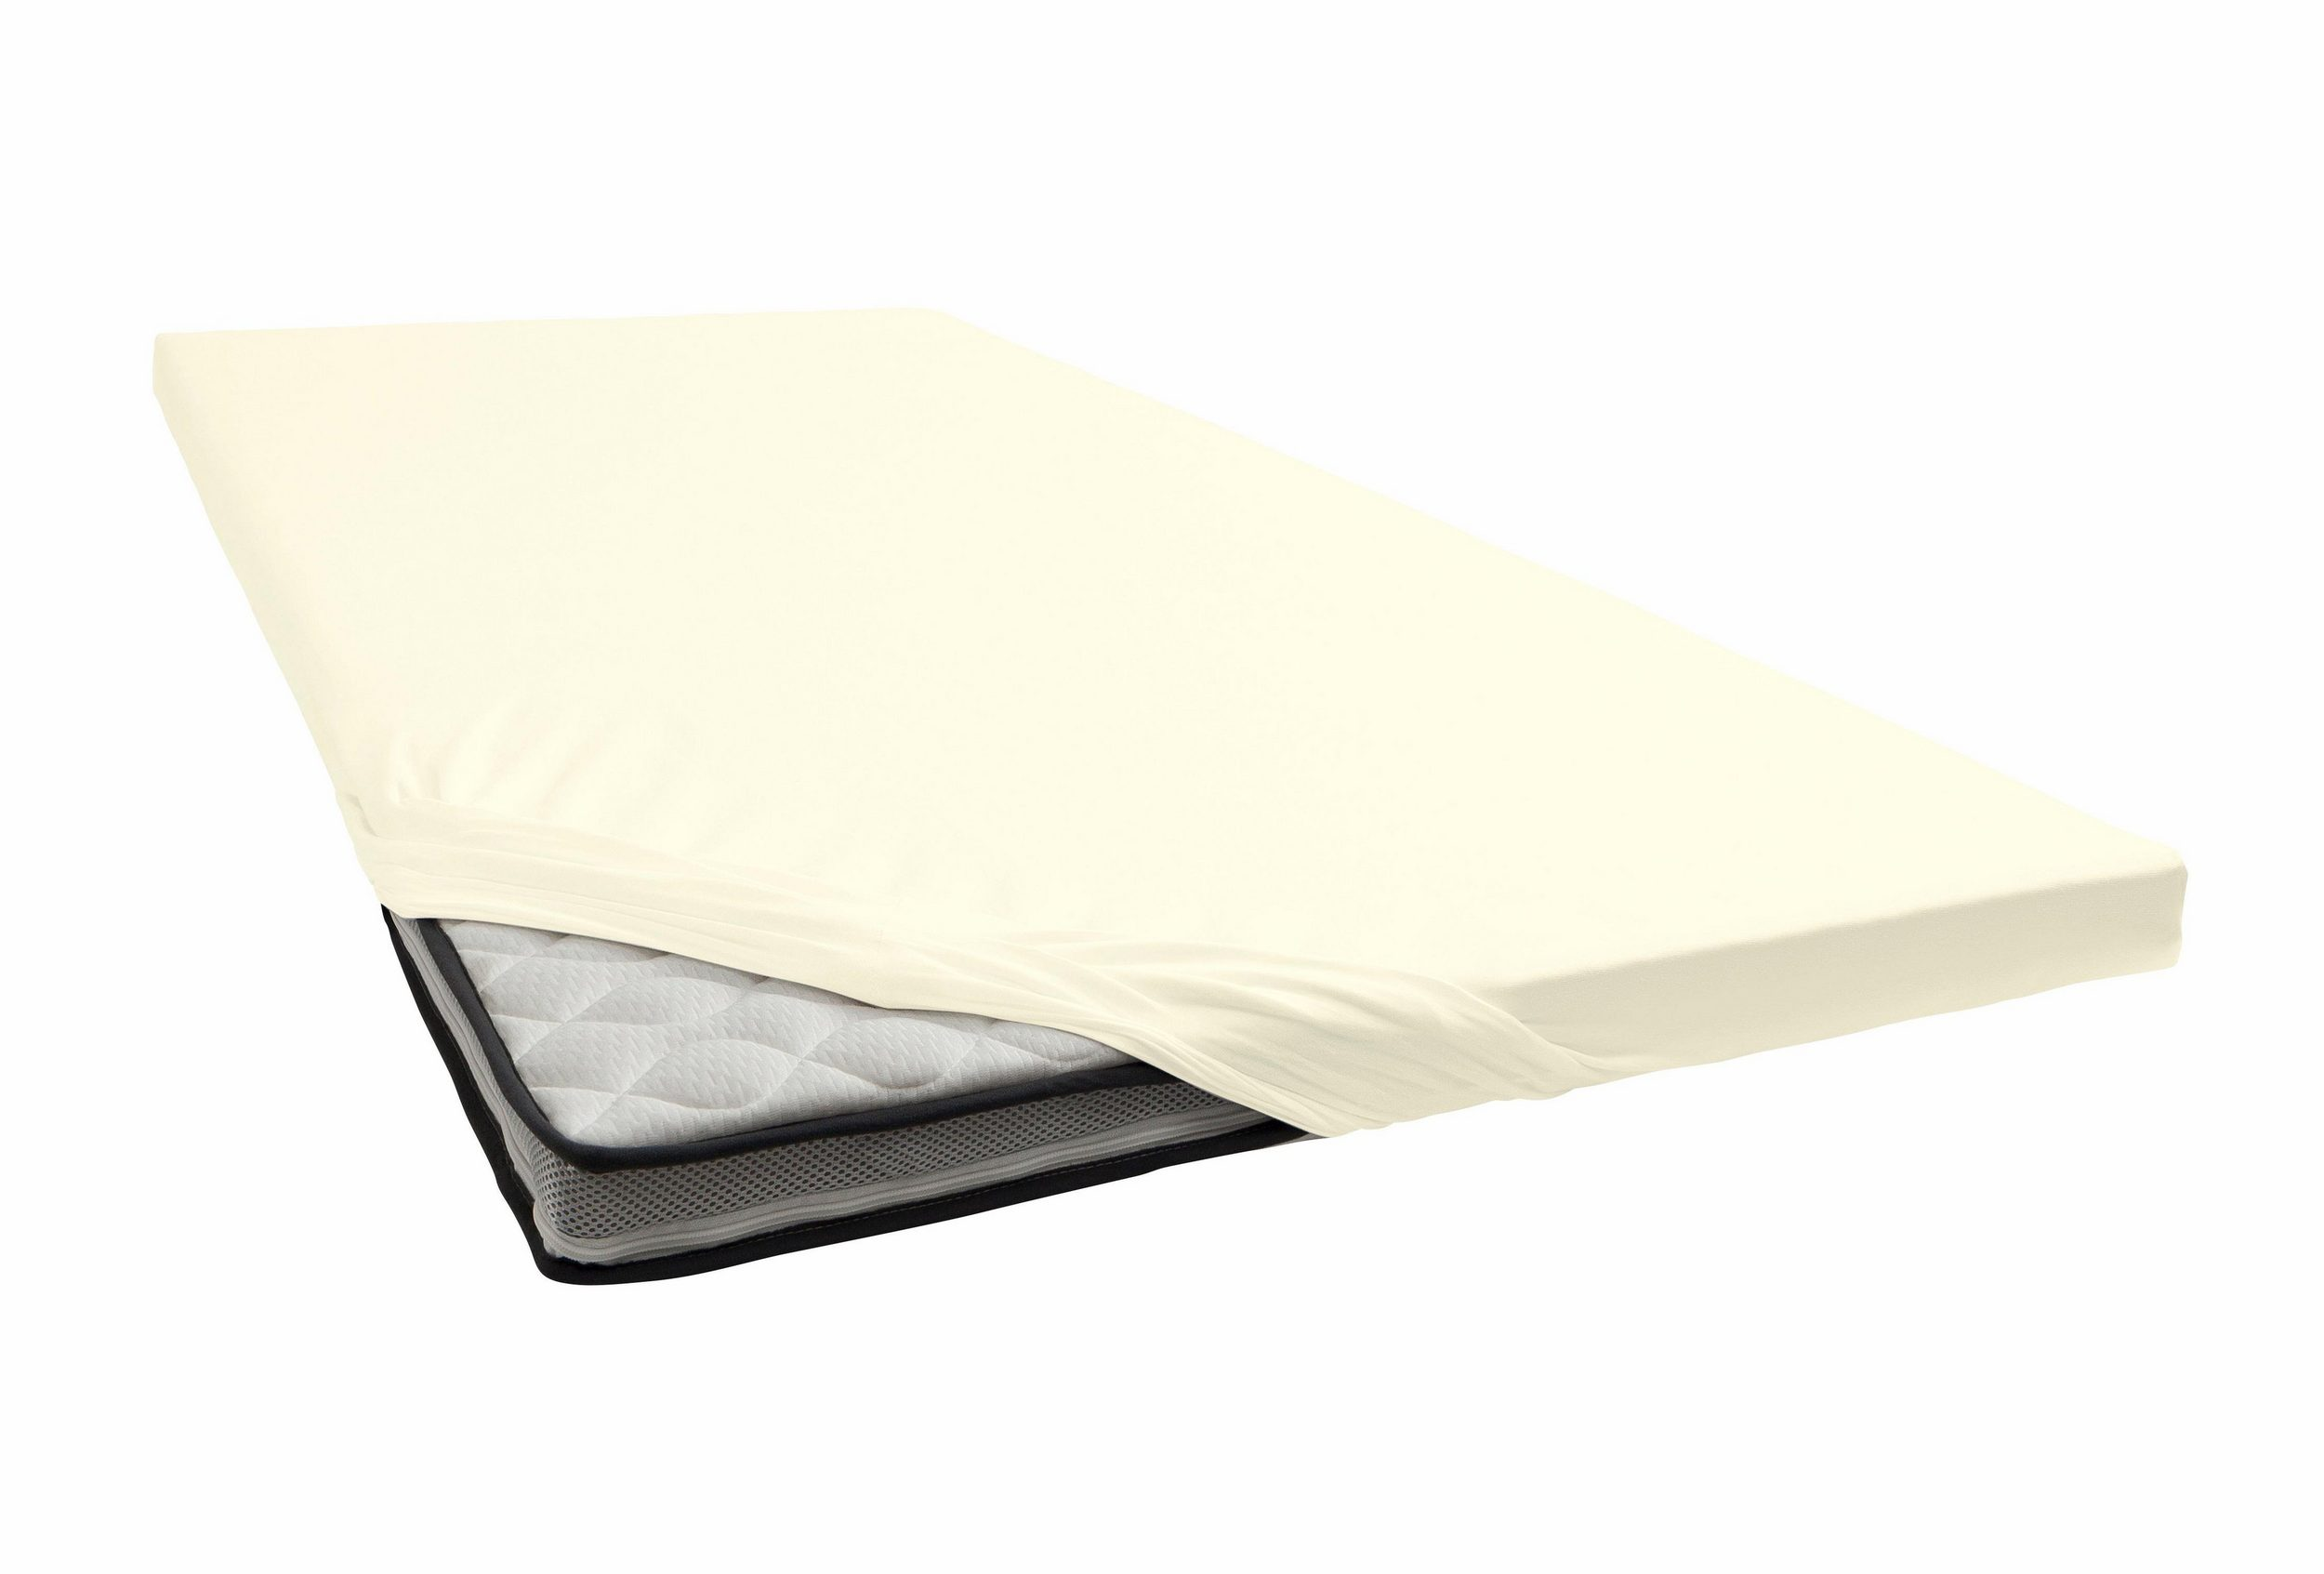 boxspringbett mit motor elektrisch top 5 qualit ts kriterien. Black Bedroom Furniture Sets. Home Design Ideas